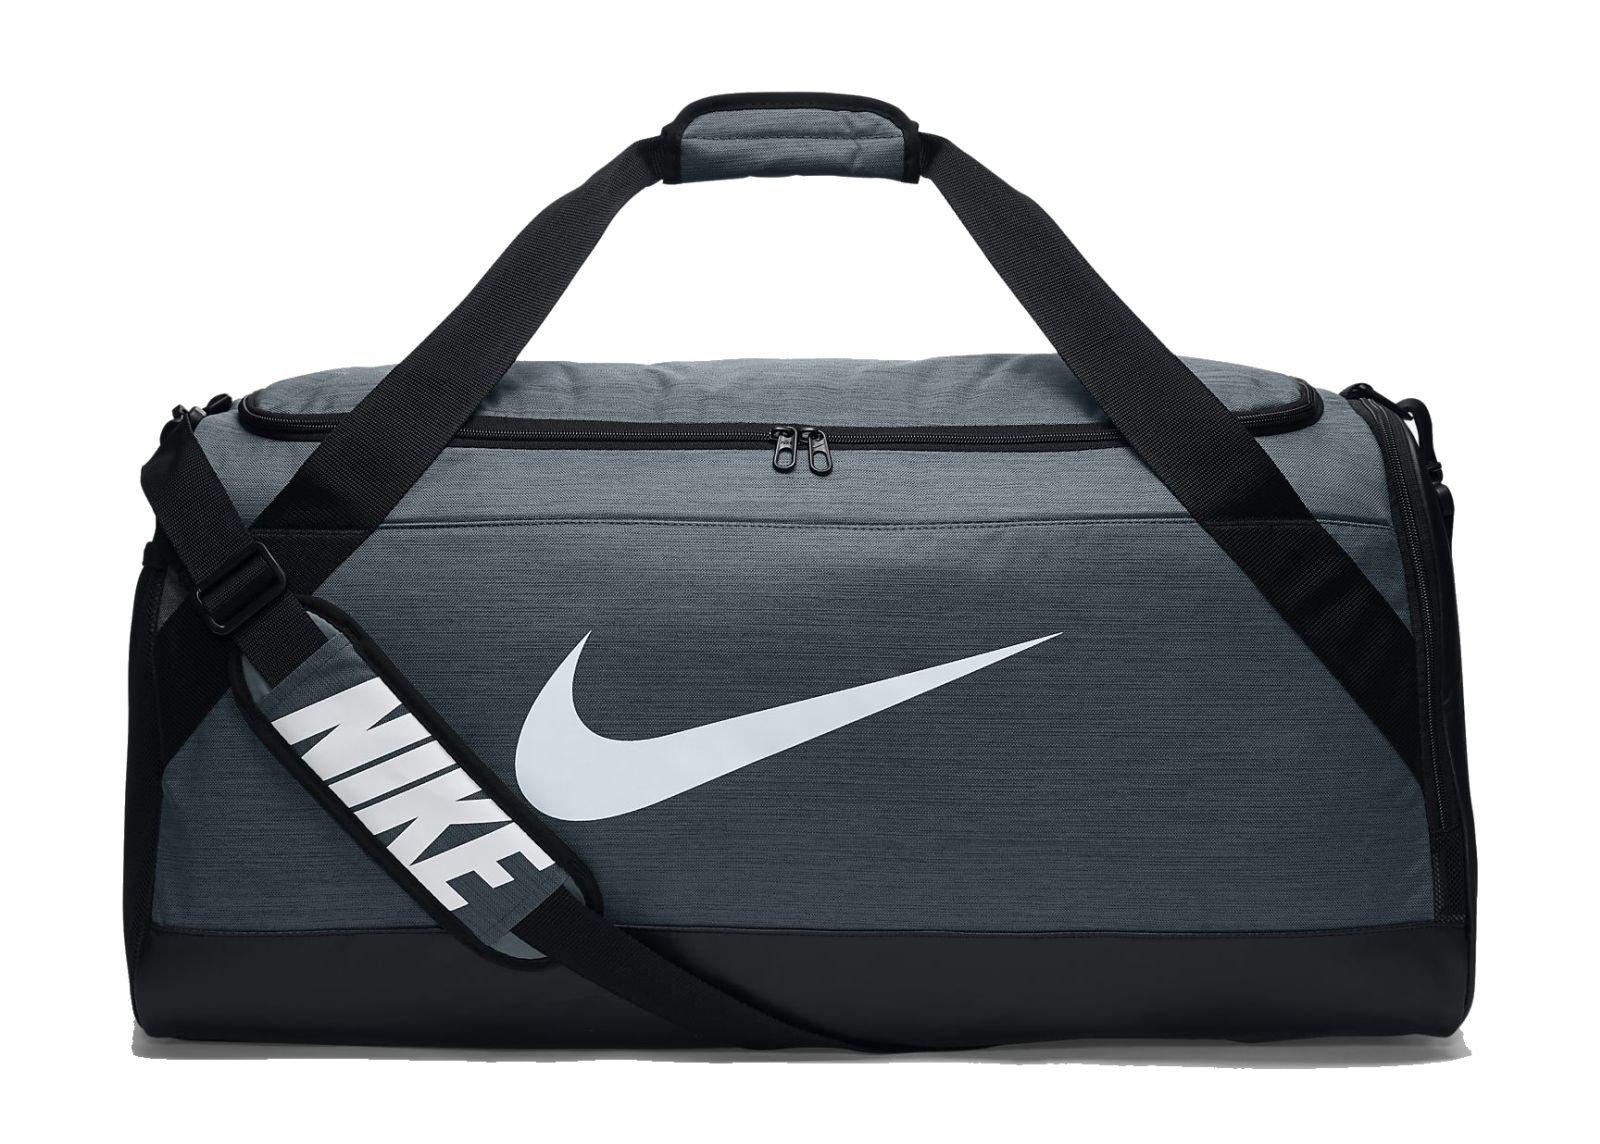 NIKE Brasilia Training Duffel Bag, Flint Grey/Black/White, Large